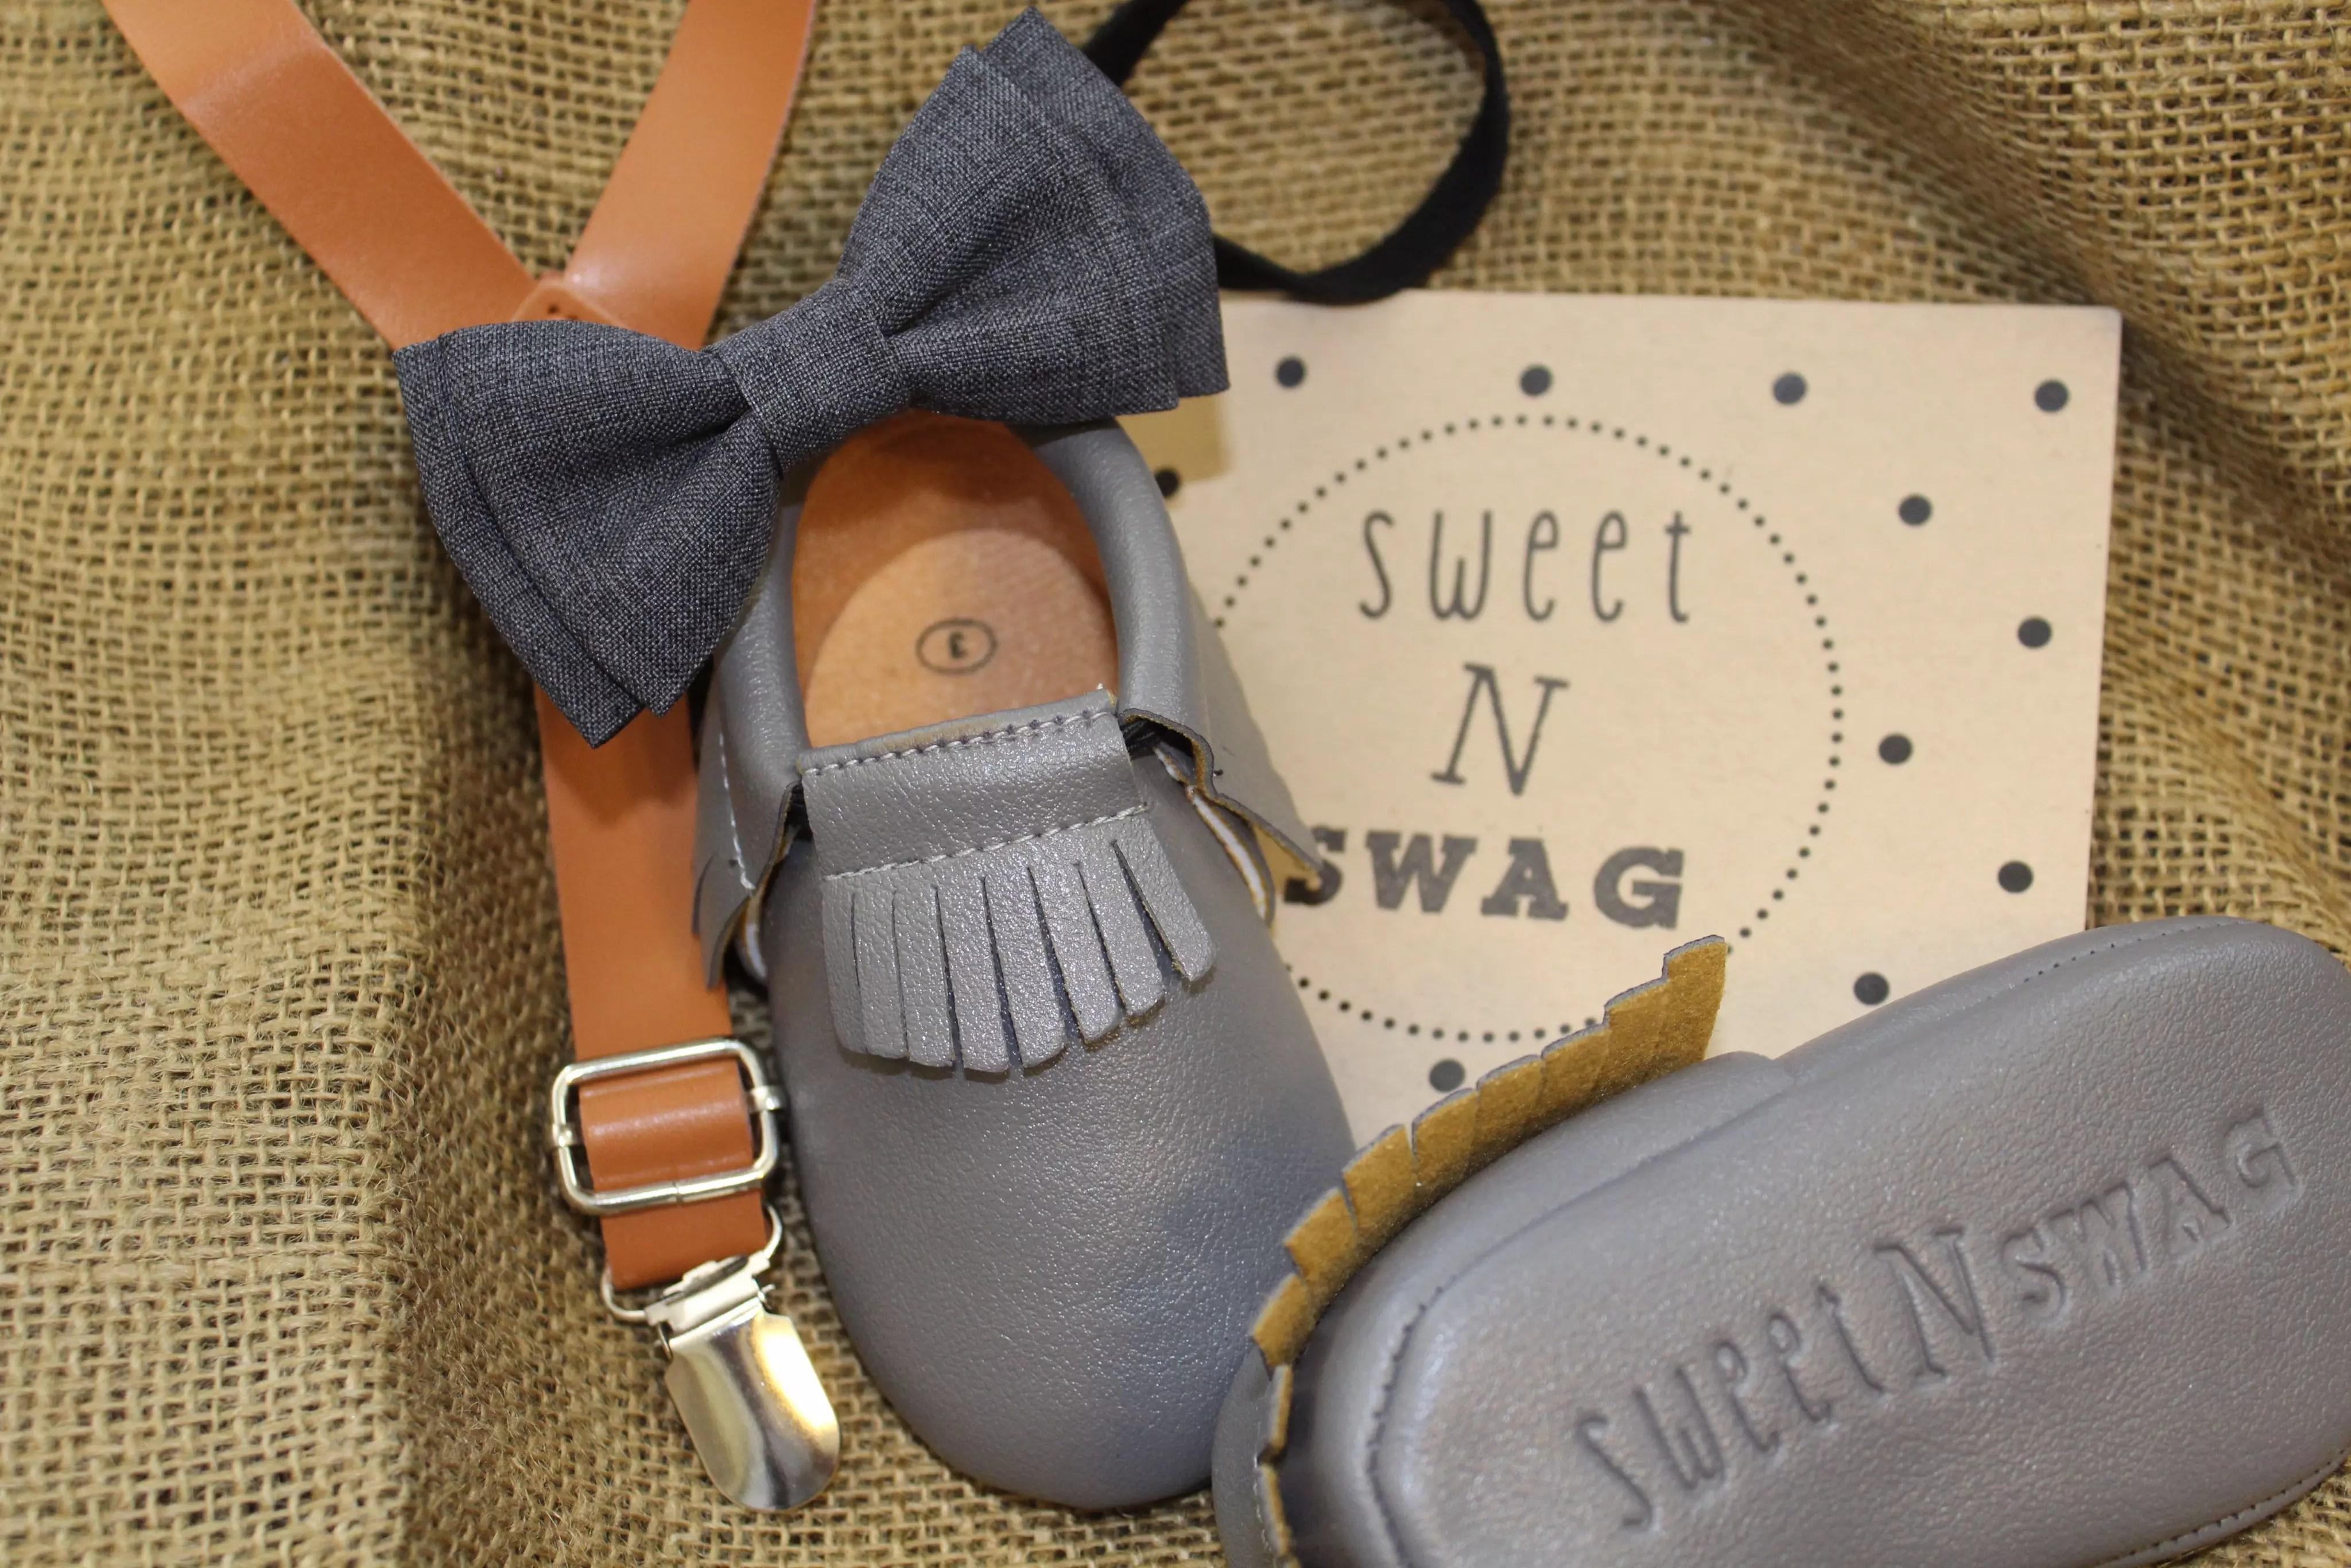 Sweetnswag Coupon code